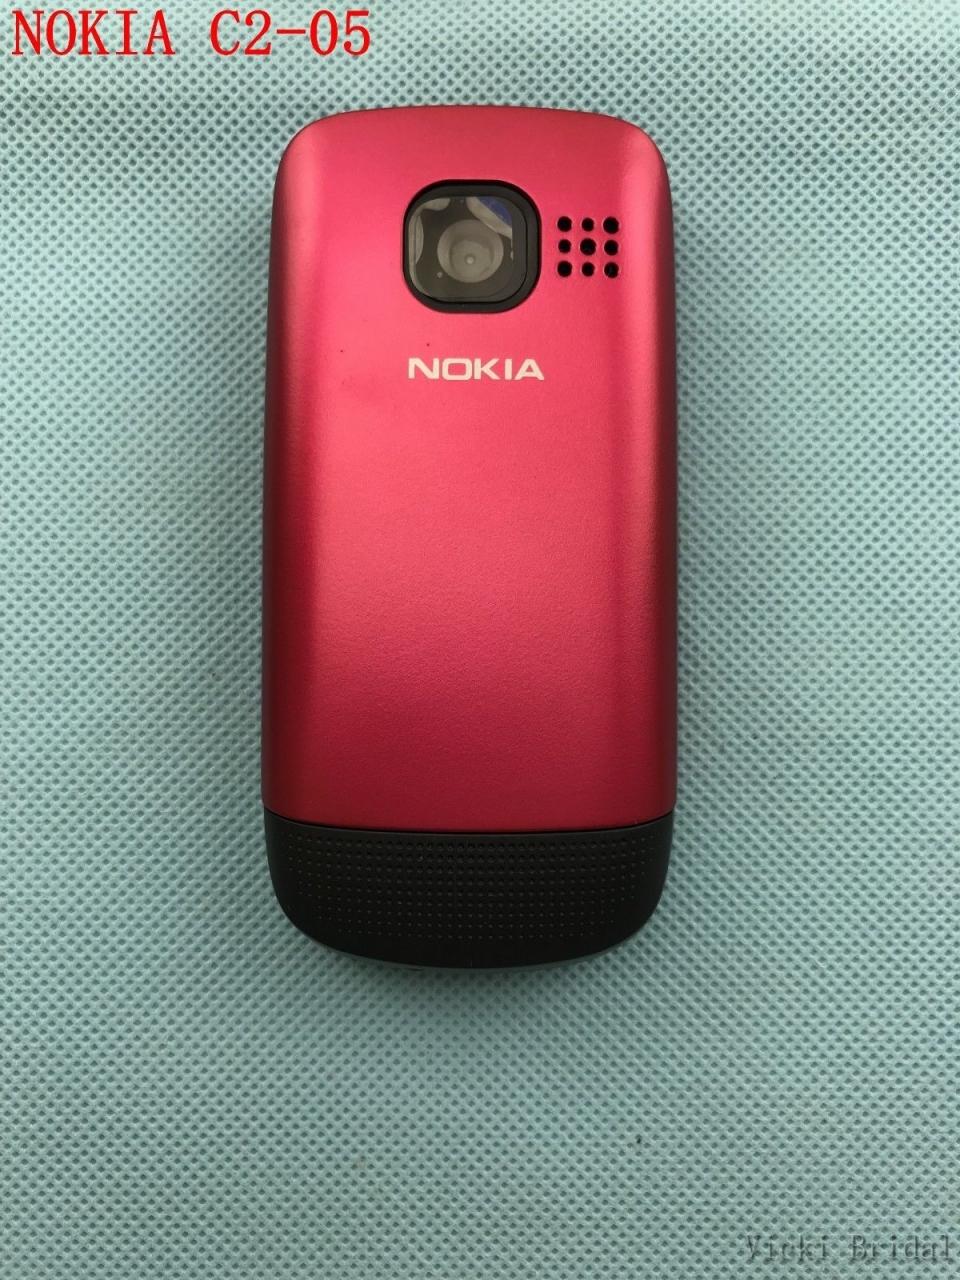 Refurbished phone Original Unlocked Nokia C2-05 slide cell phone Bluetooth phone black 6